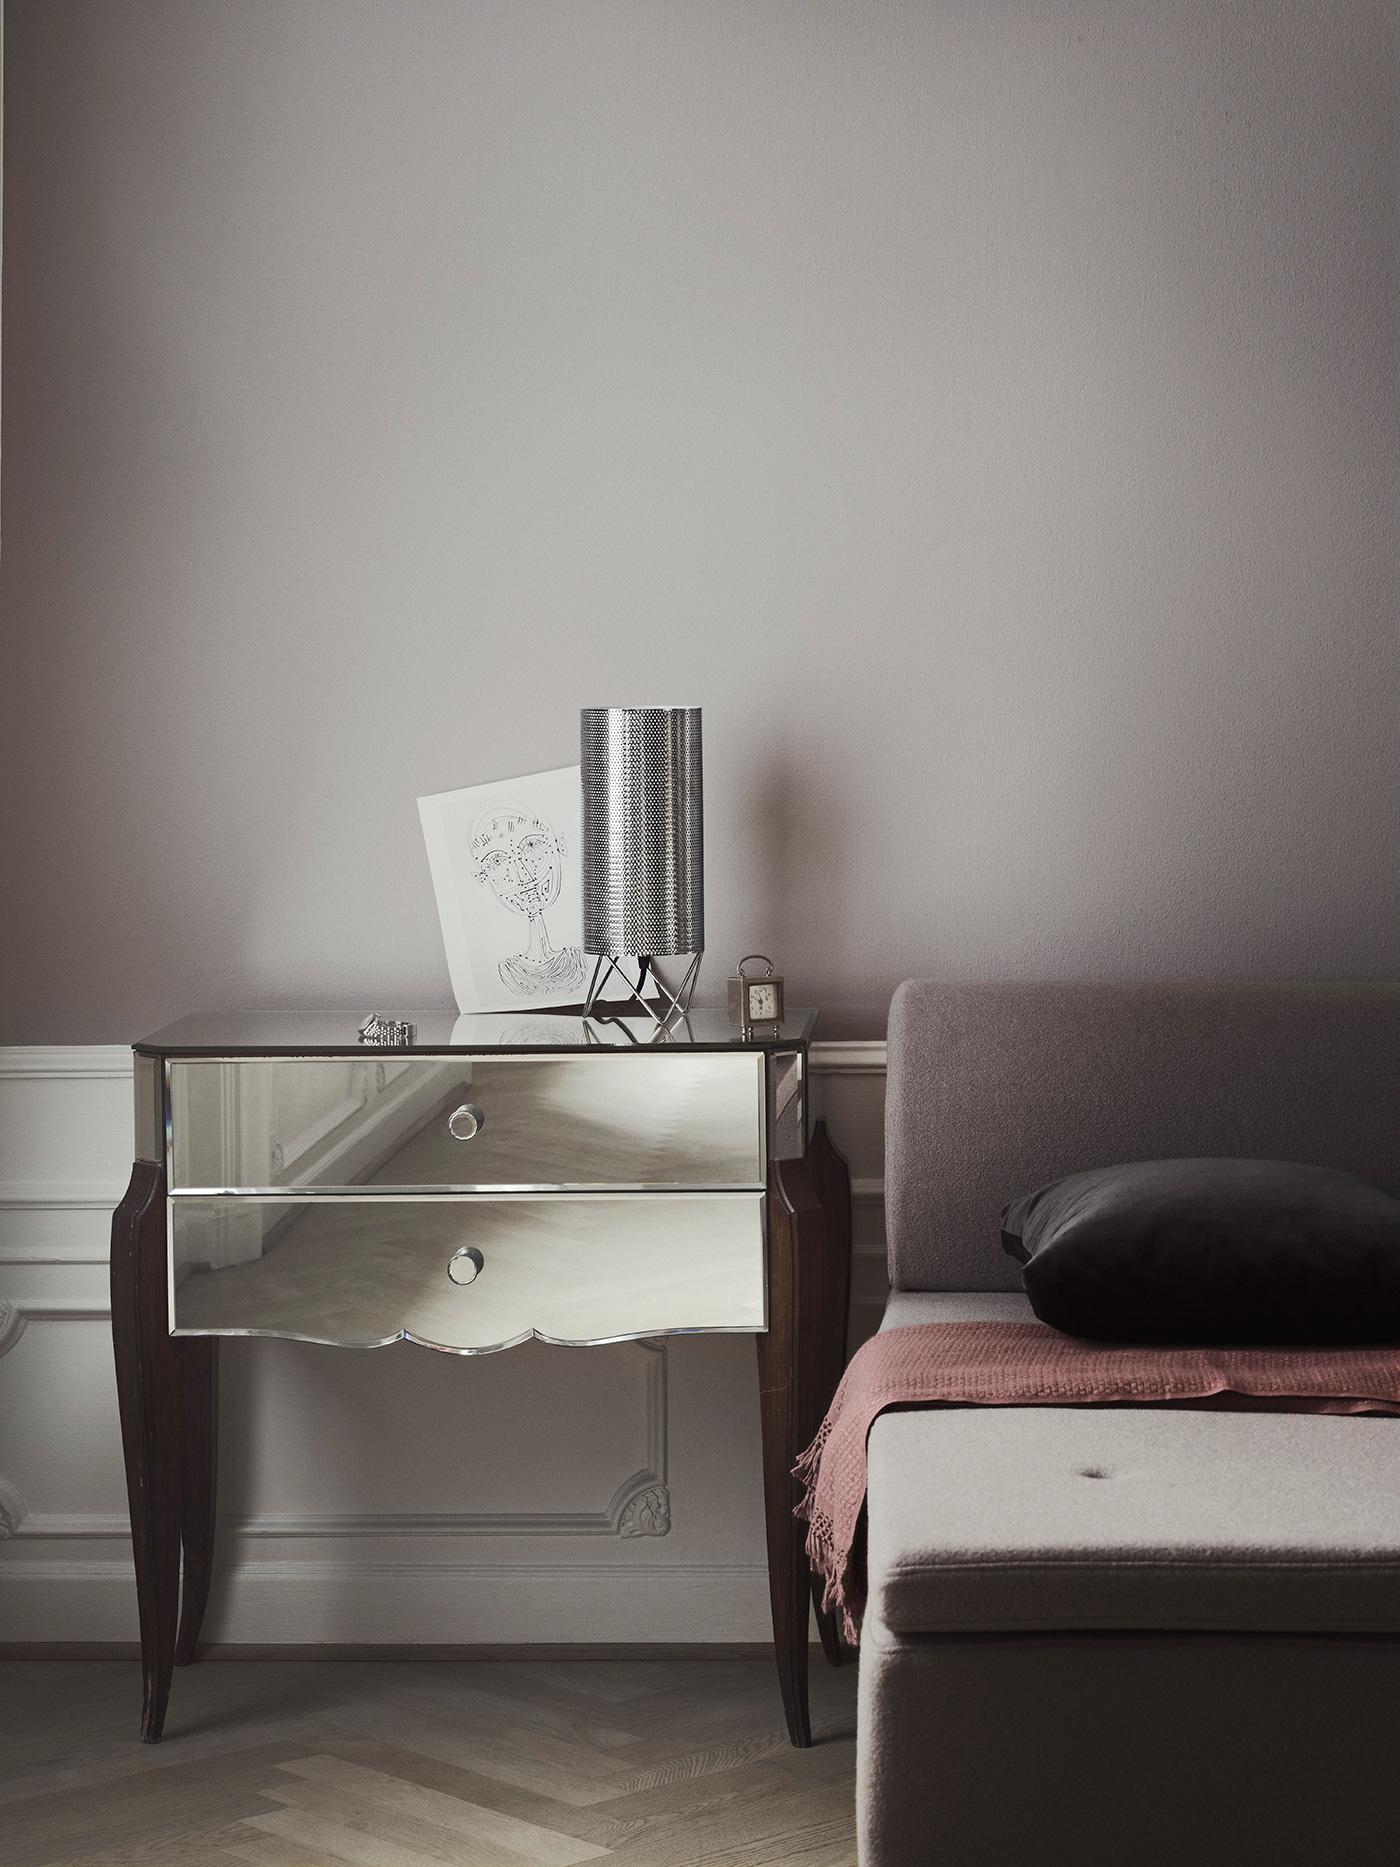 TinnappleMetz-Gubi-h2o-table-lamp-02